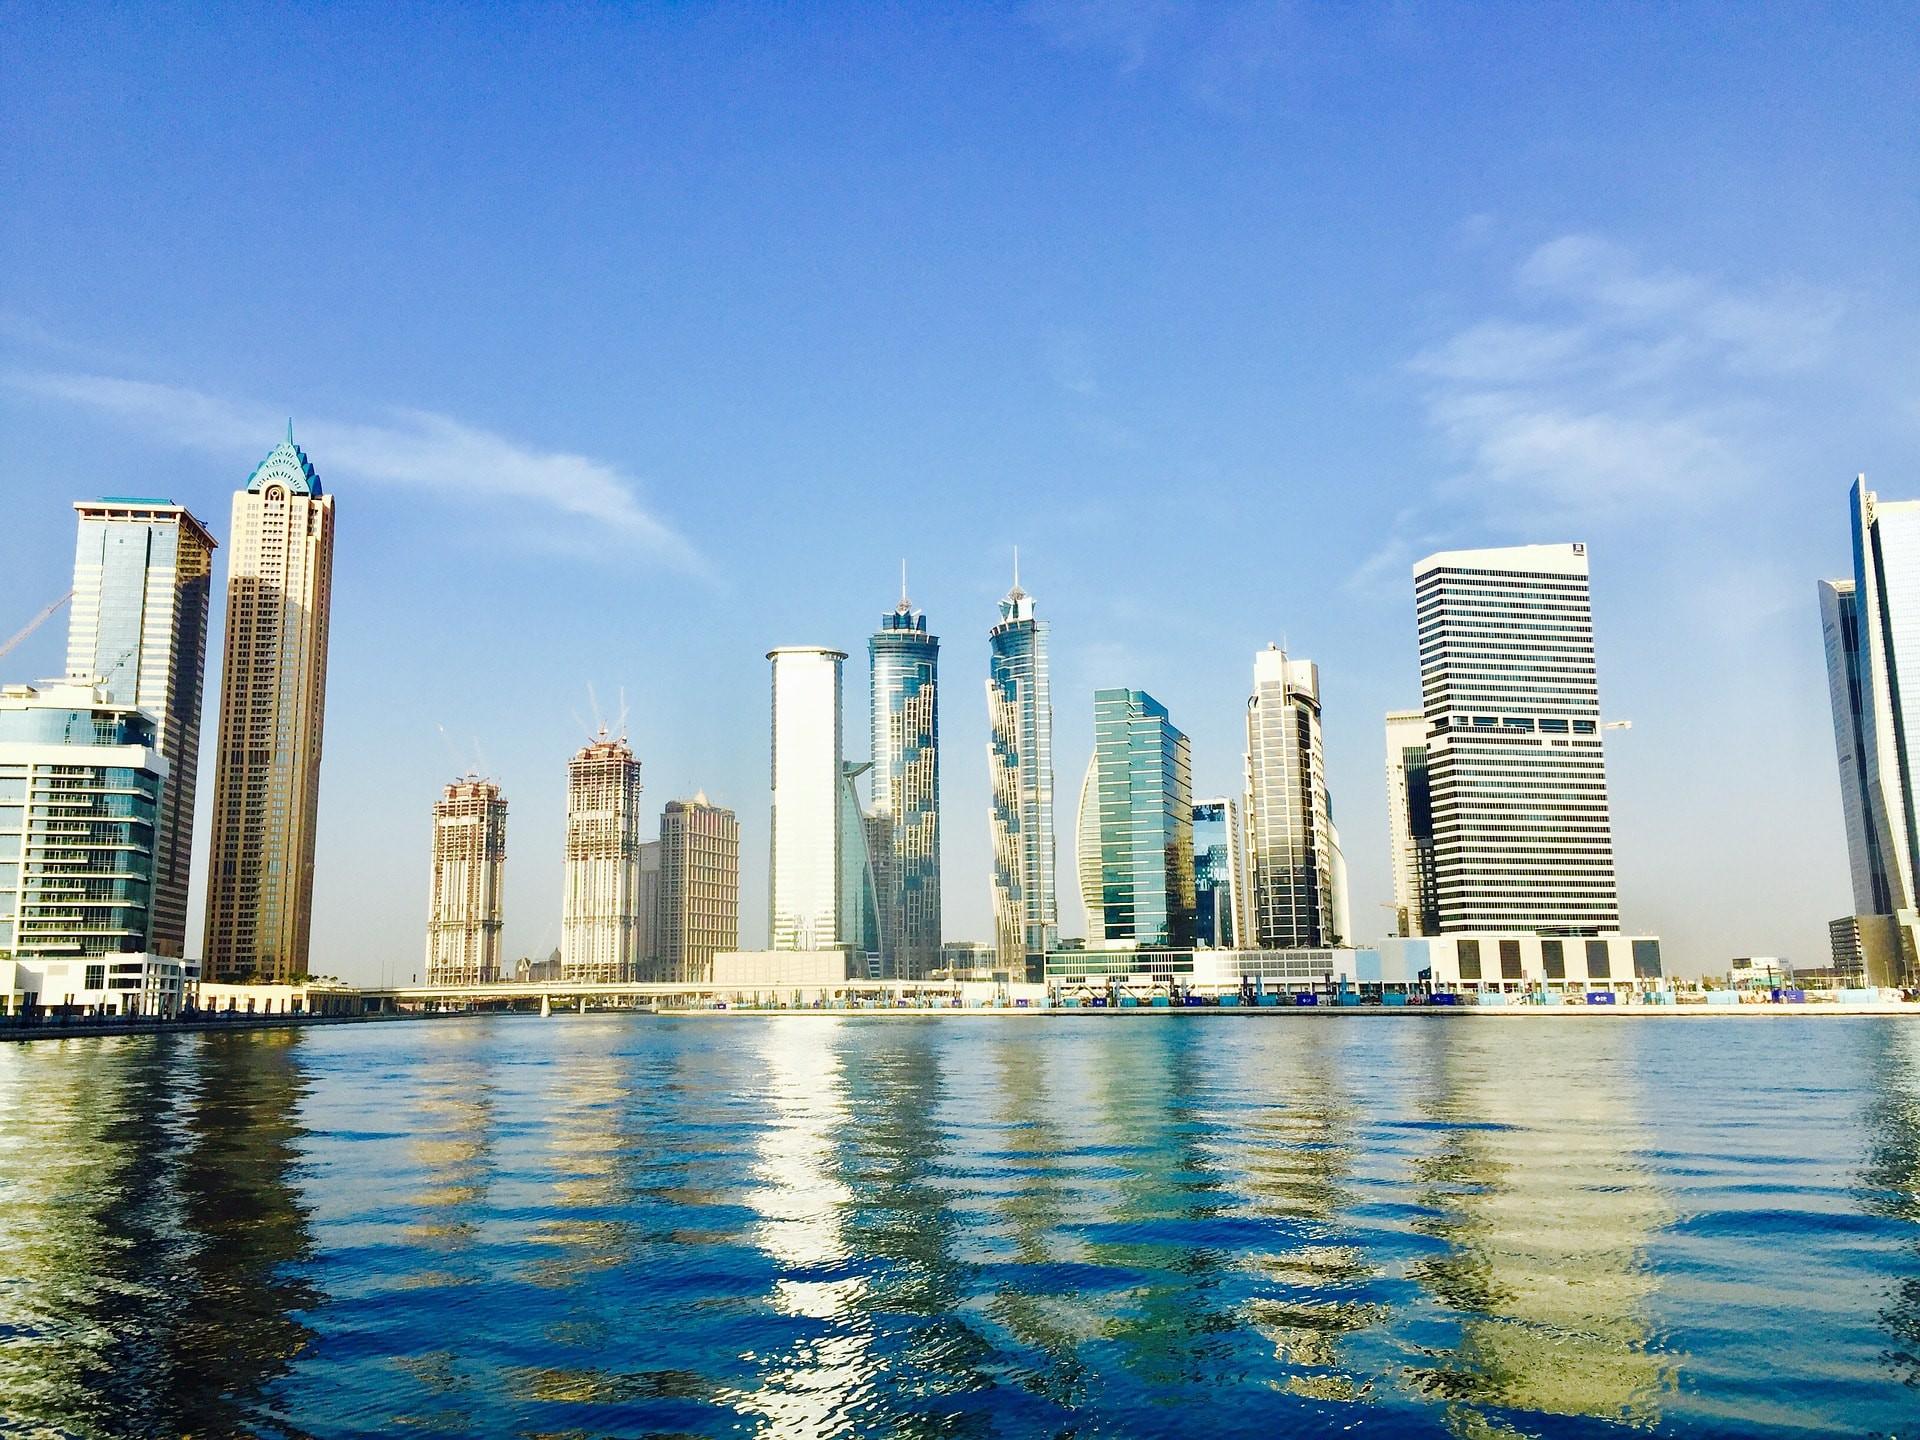 Dubai Water Canal | © lmoon/Pixabay